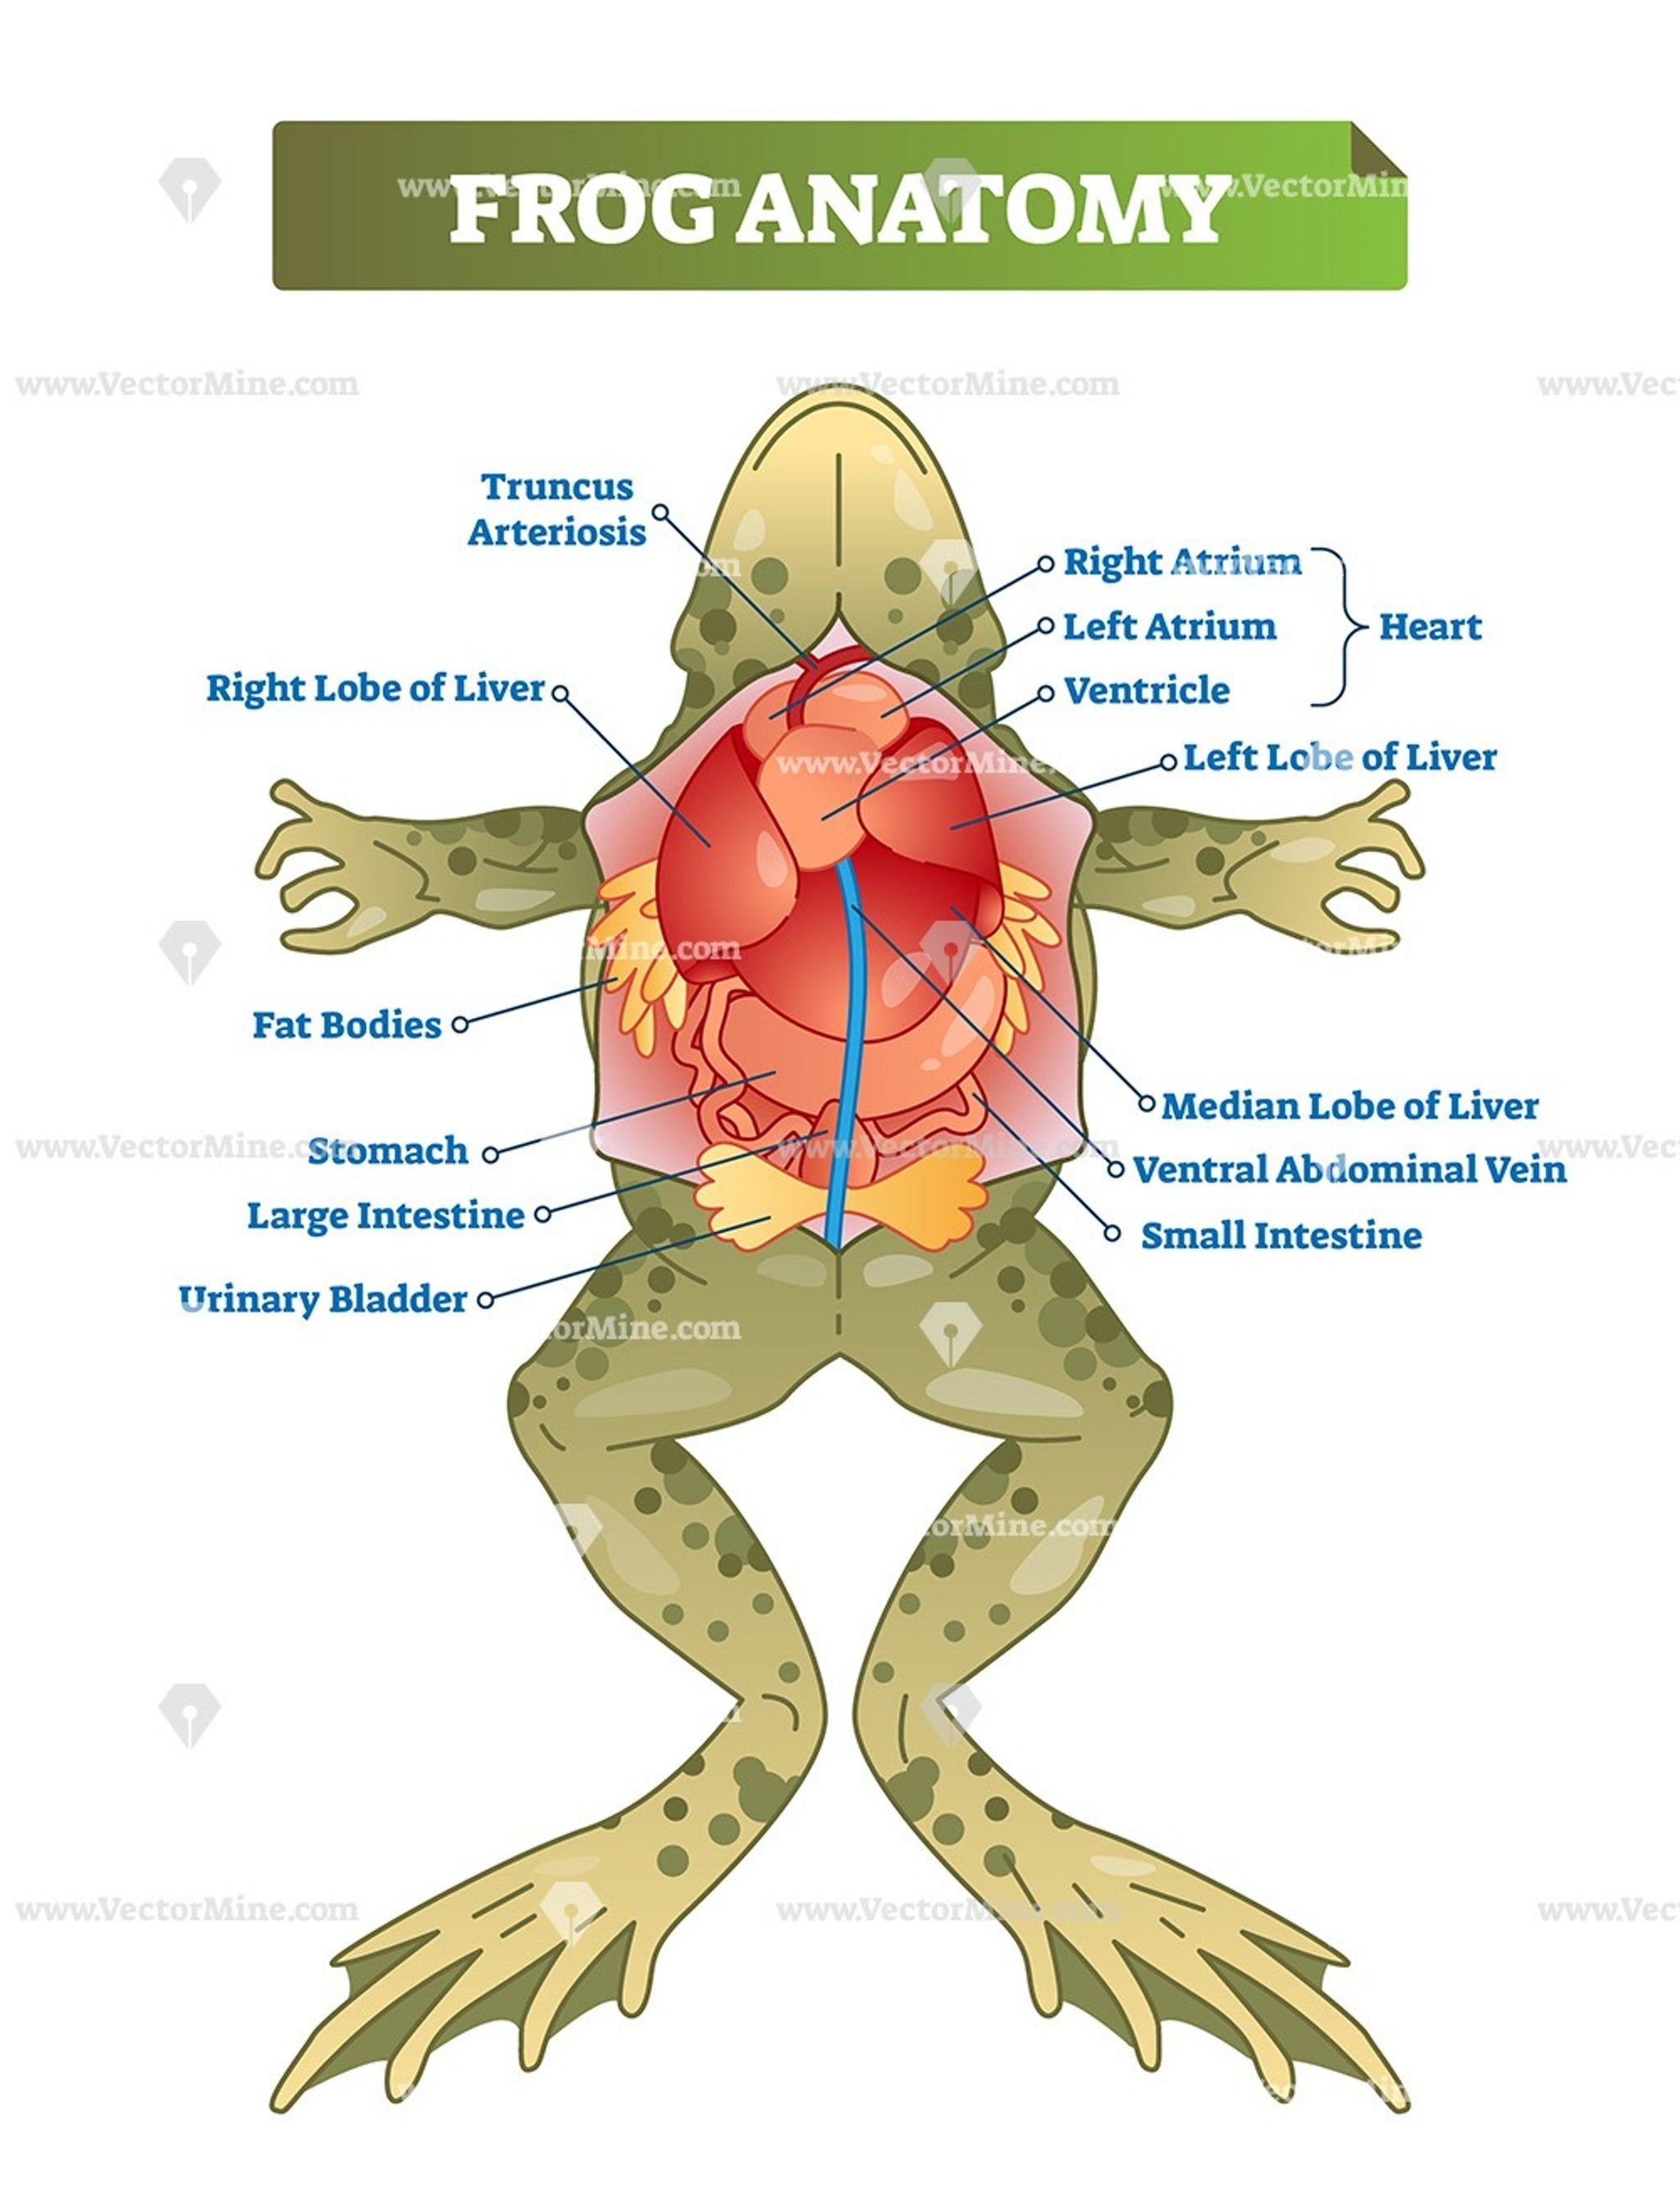 Frog Anatomy Educational Vector Illustration Diagram